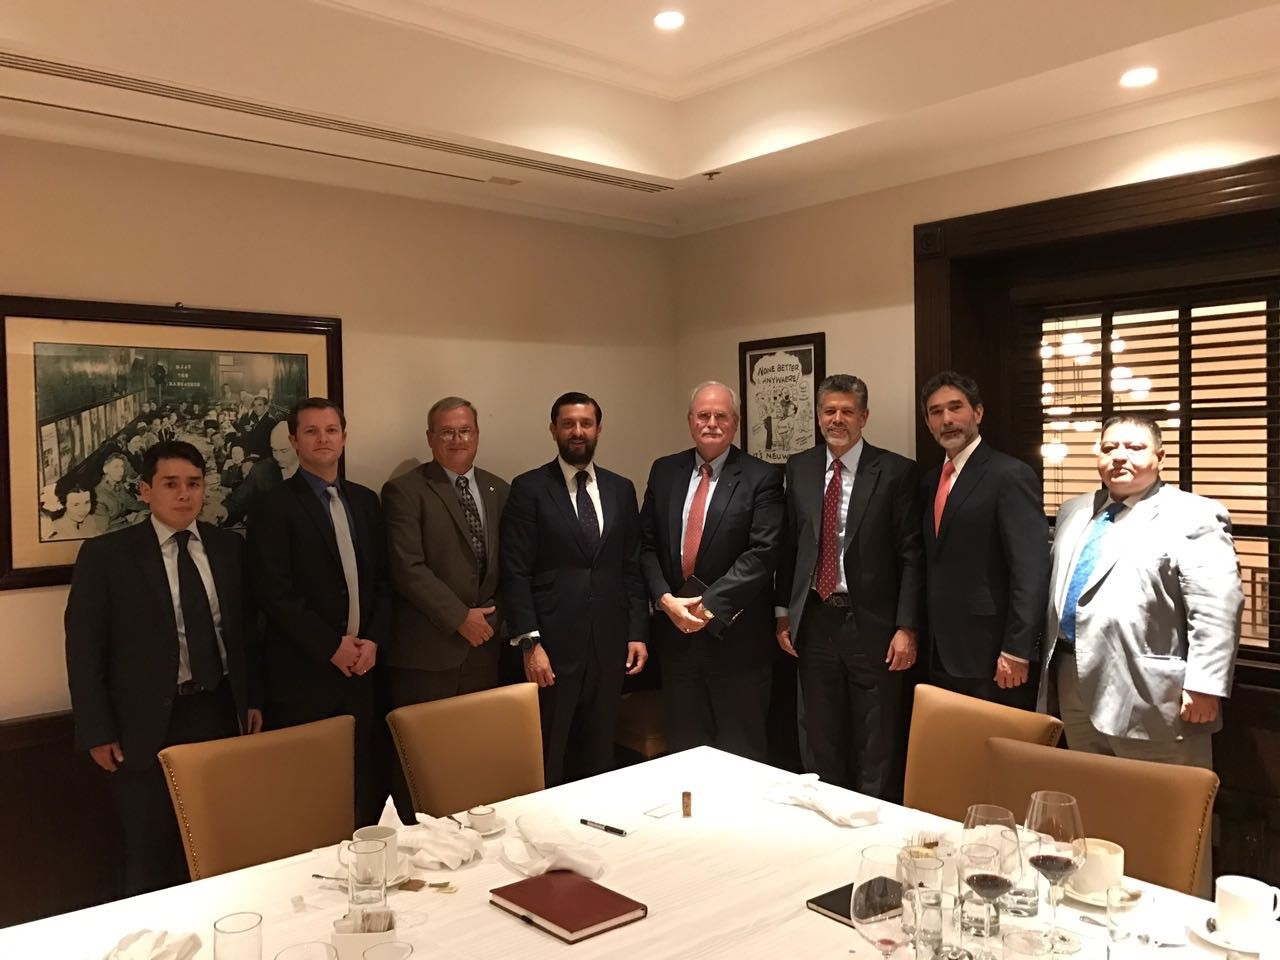 USGC Leadership in Mexico